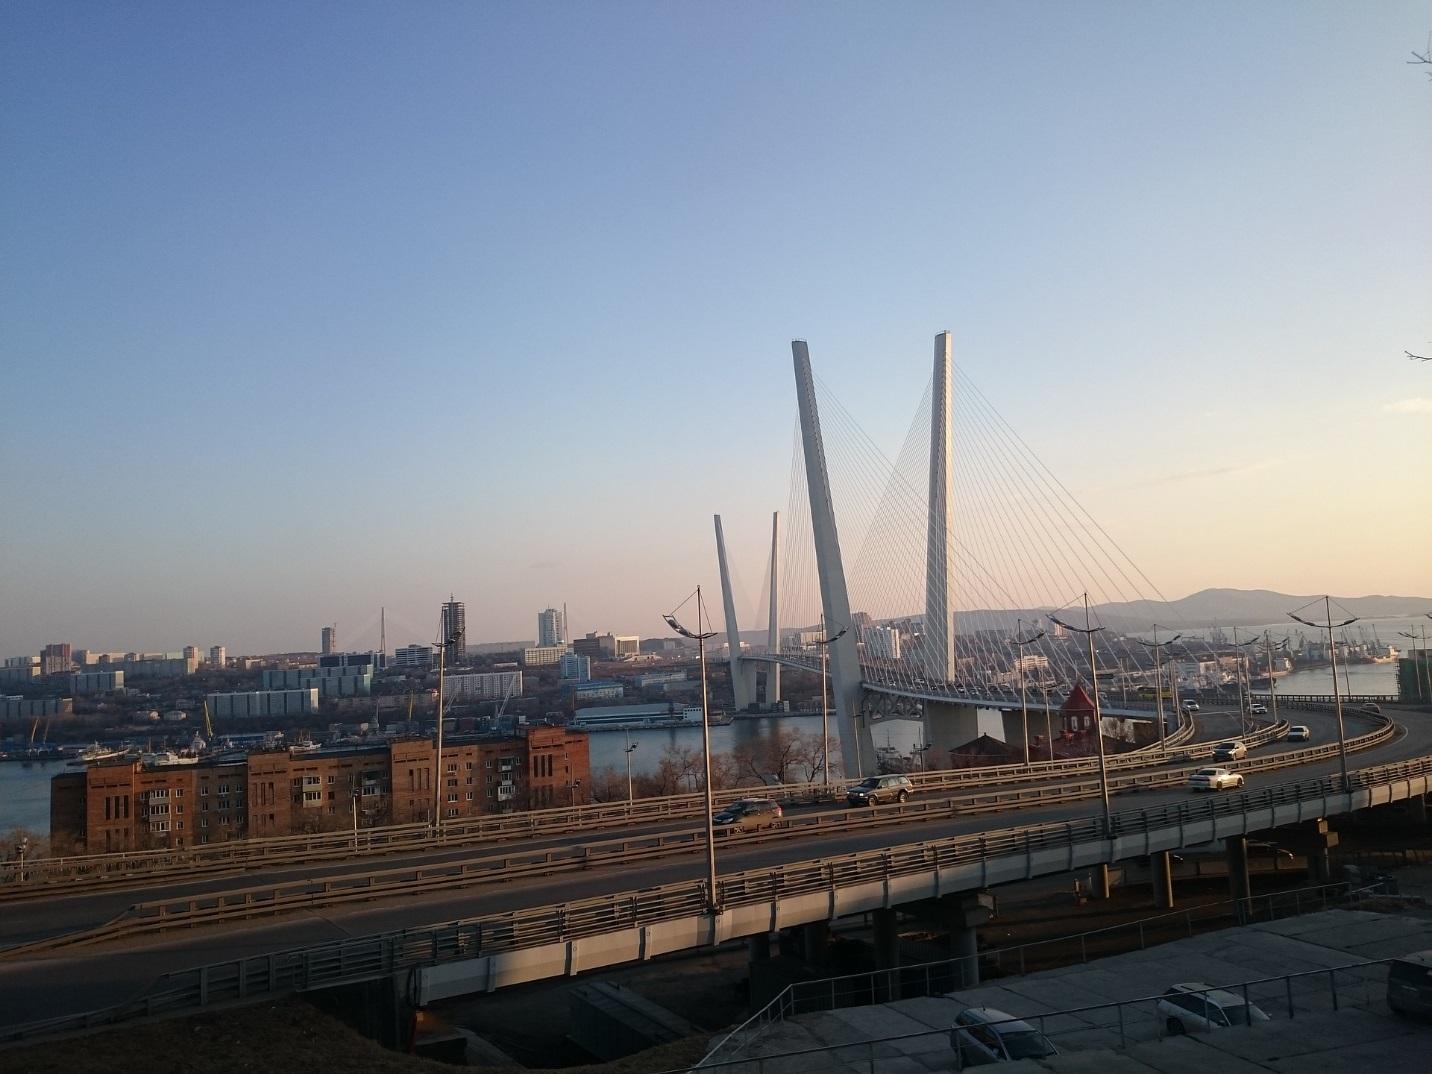 9 great reasons to visit vladivostok - 9 Great Reasons To Visit Vladivostok - 9 Great Reasons To Visit Vladivostok